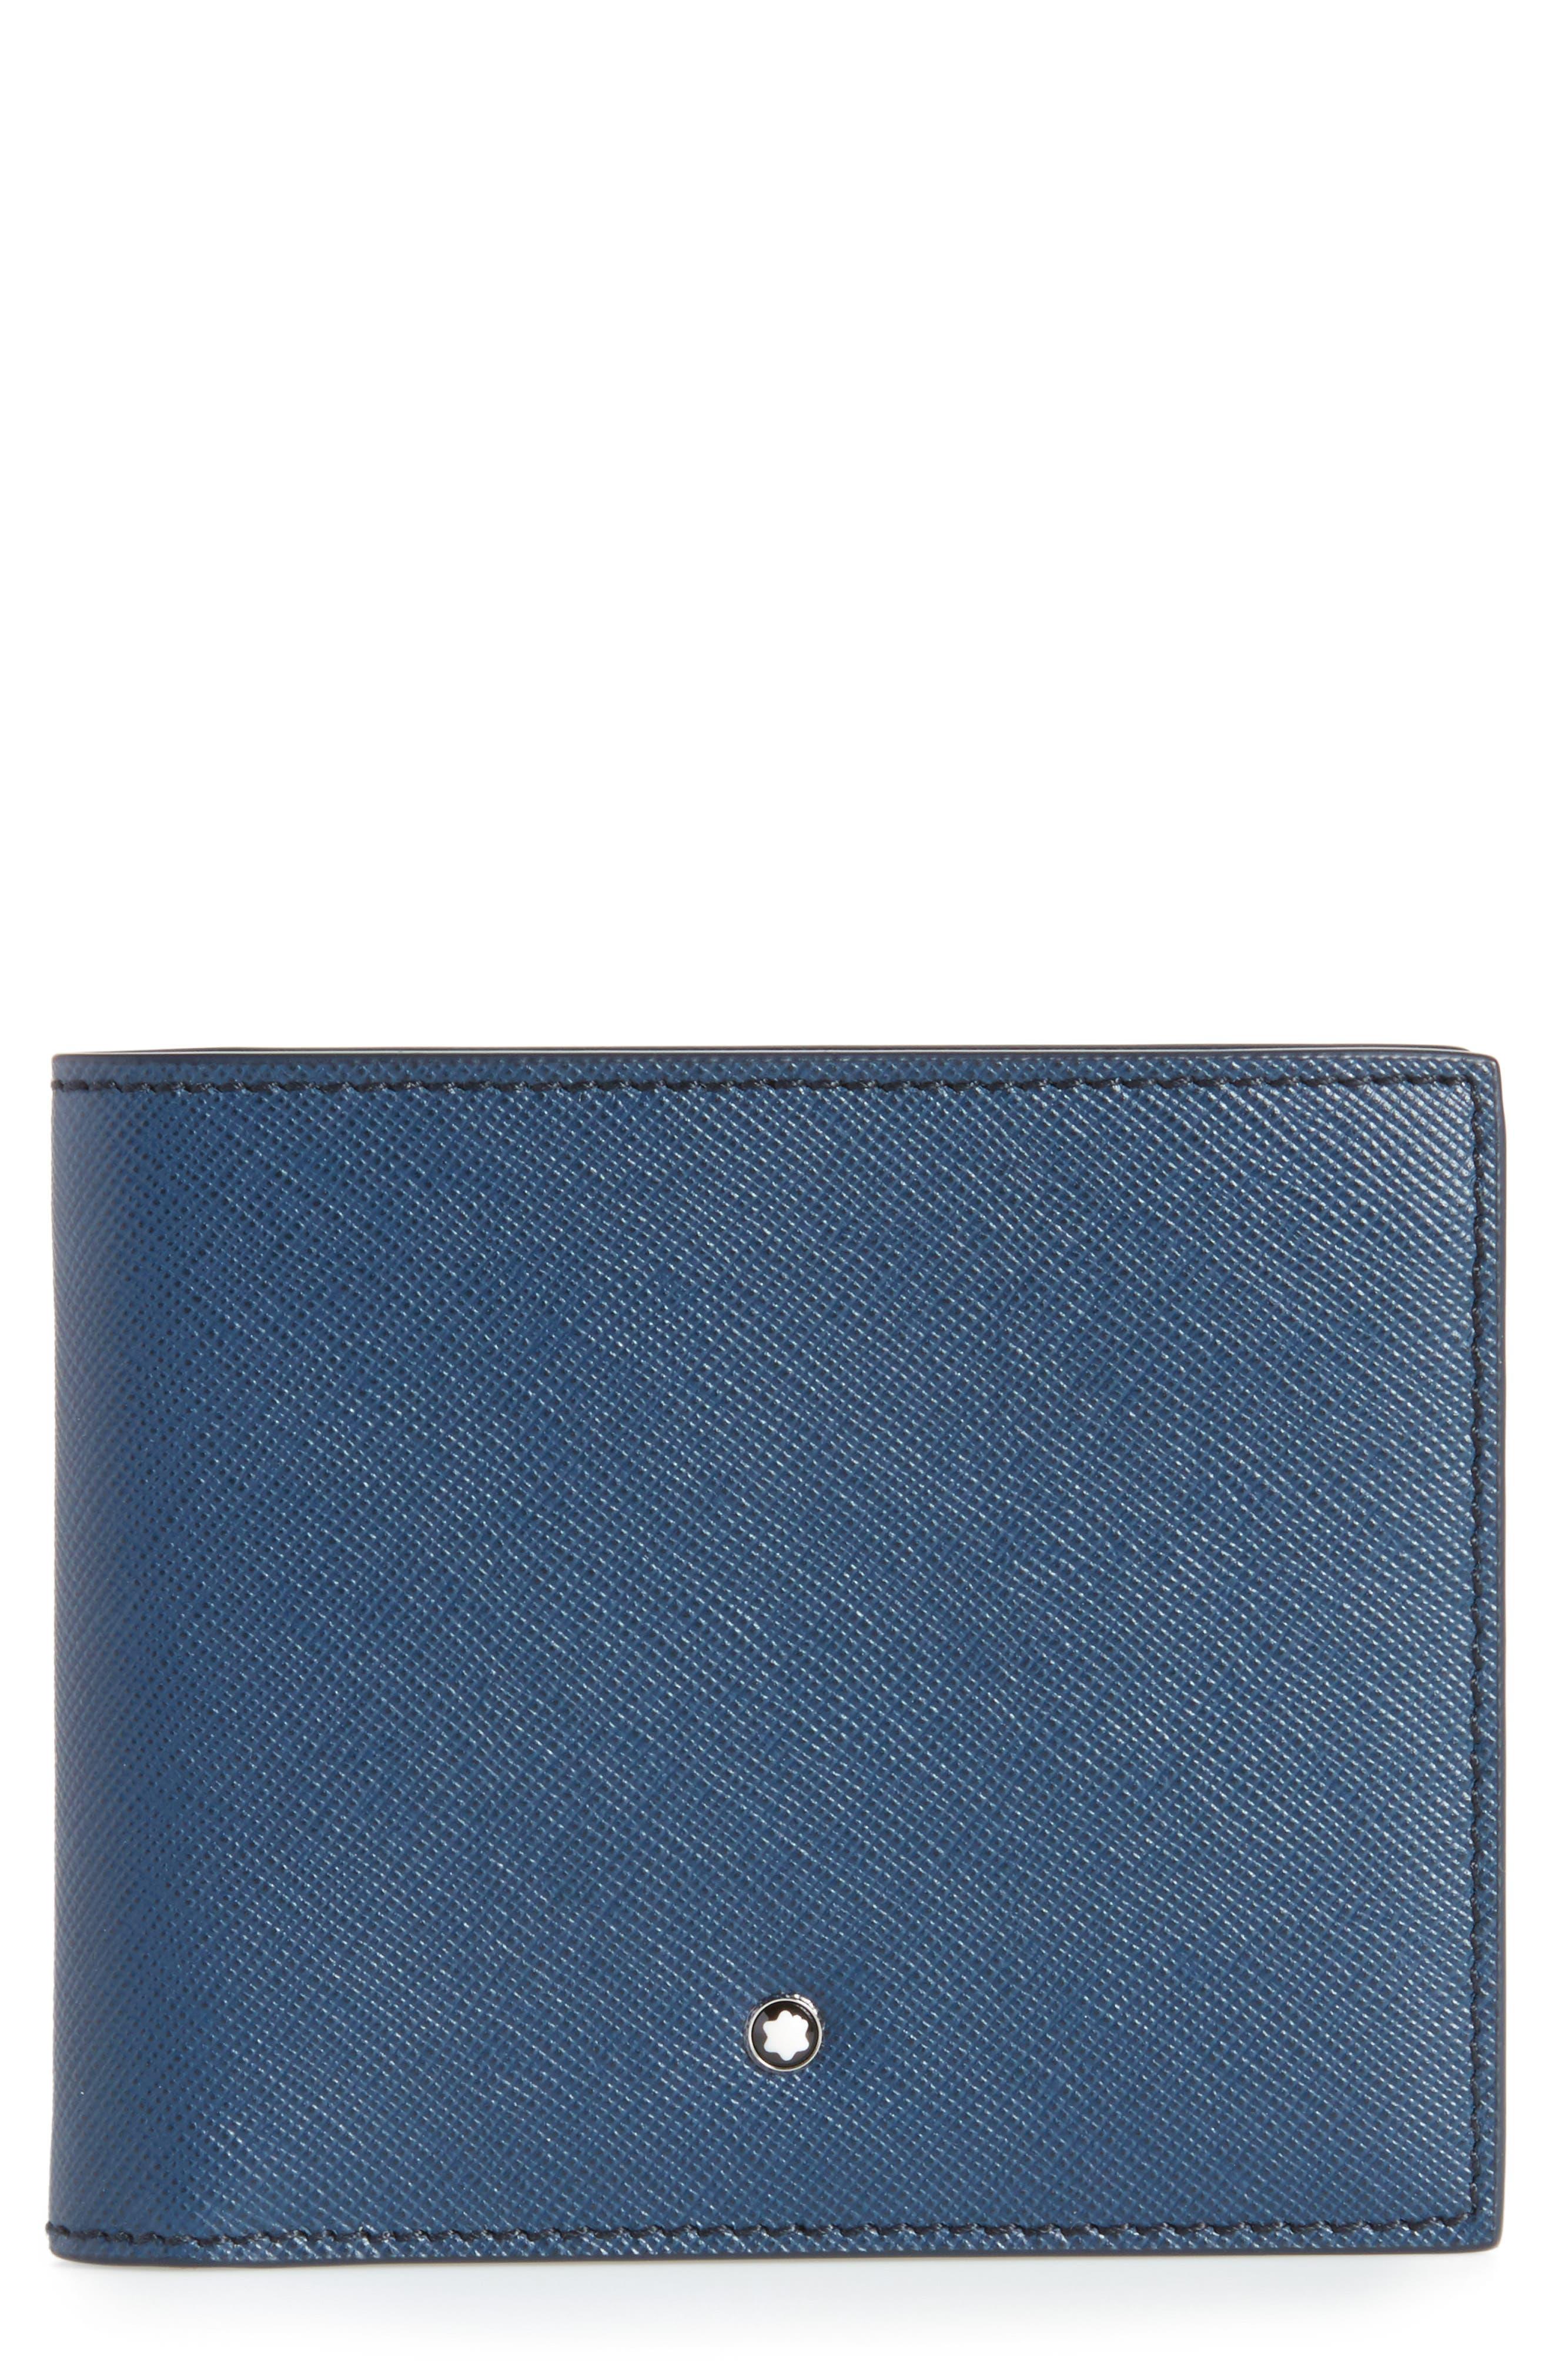 Sartorial Leather Wallet,                             Main thumbnail 1, color,                             INDIGO